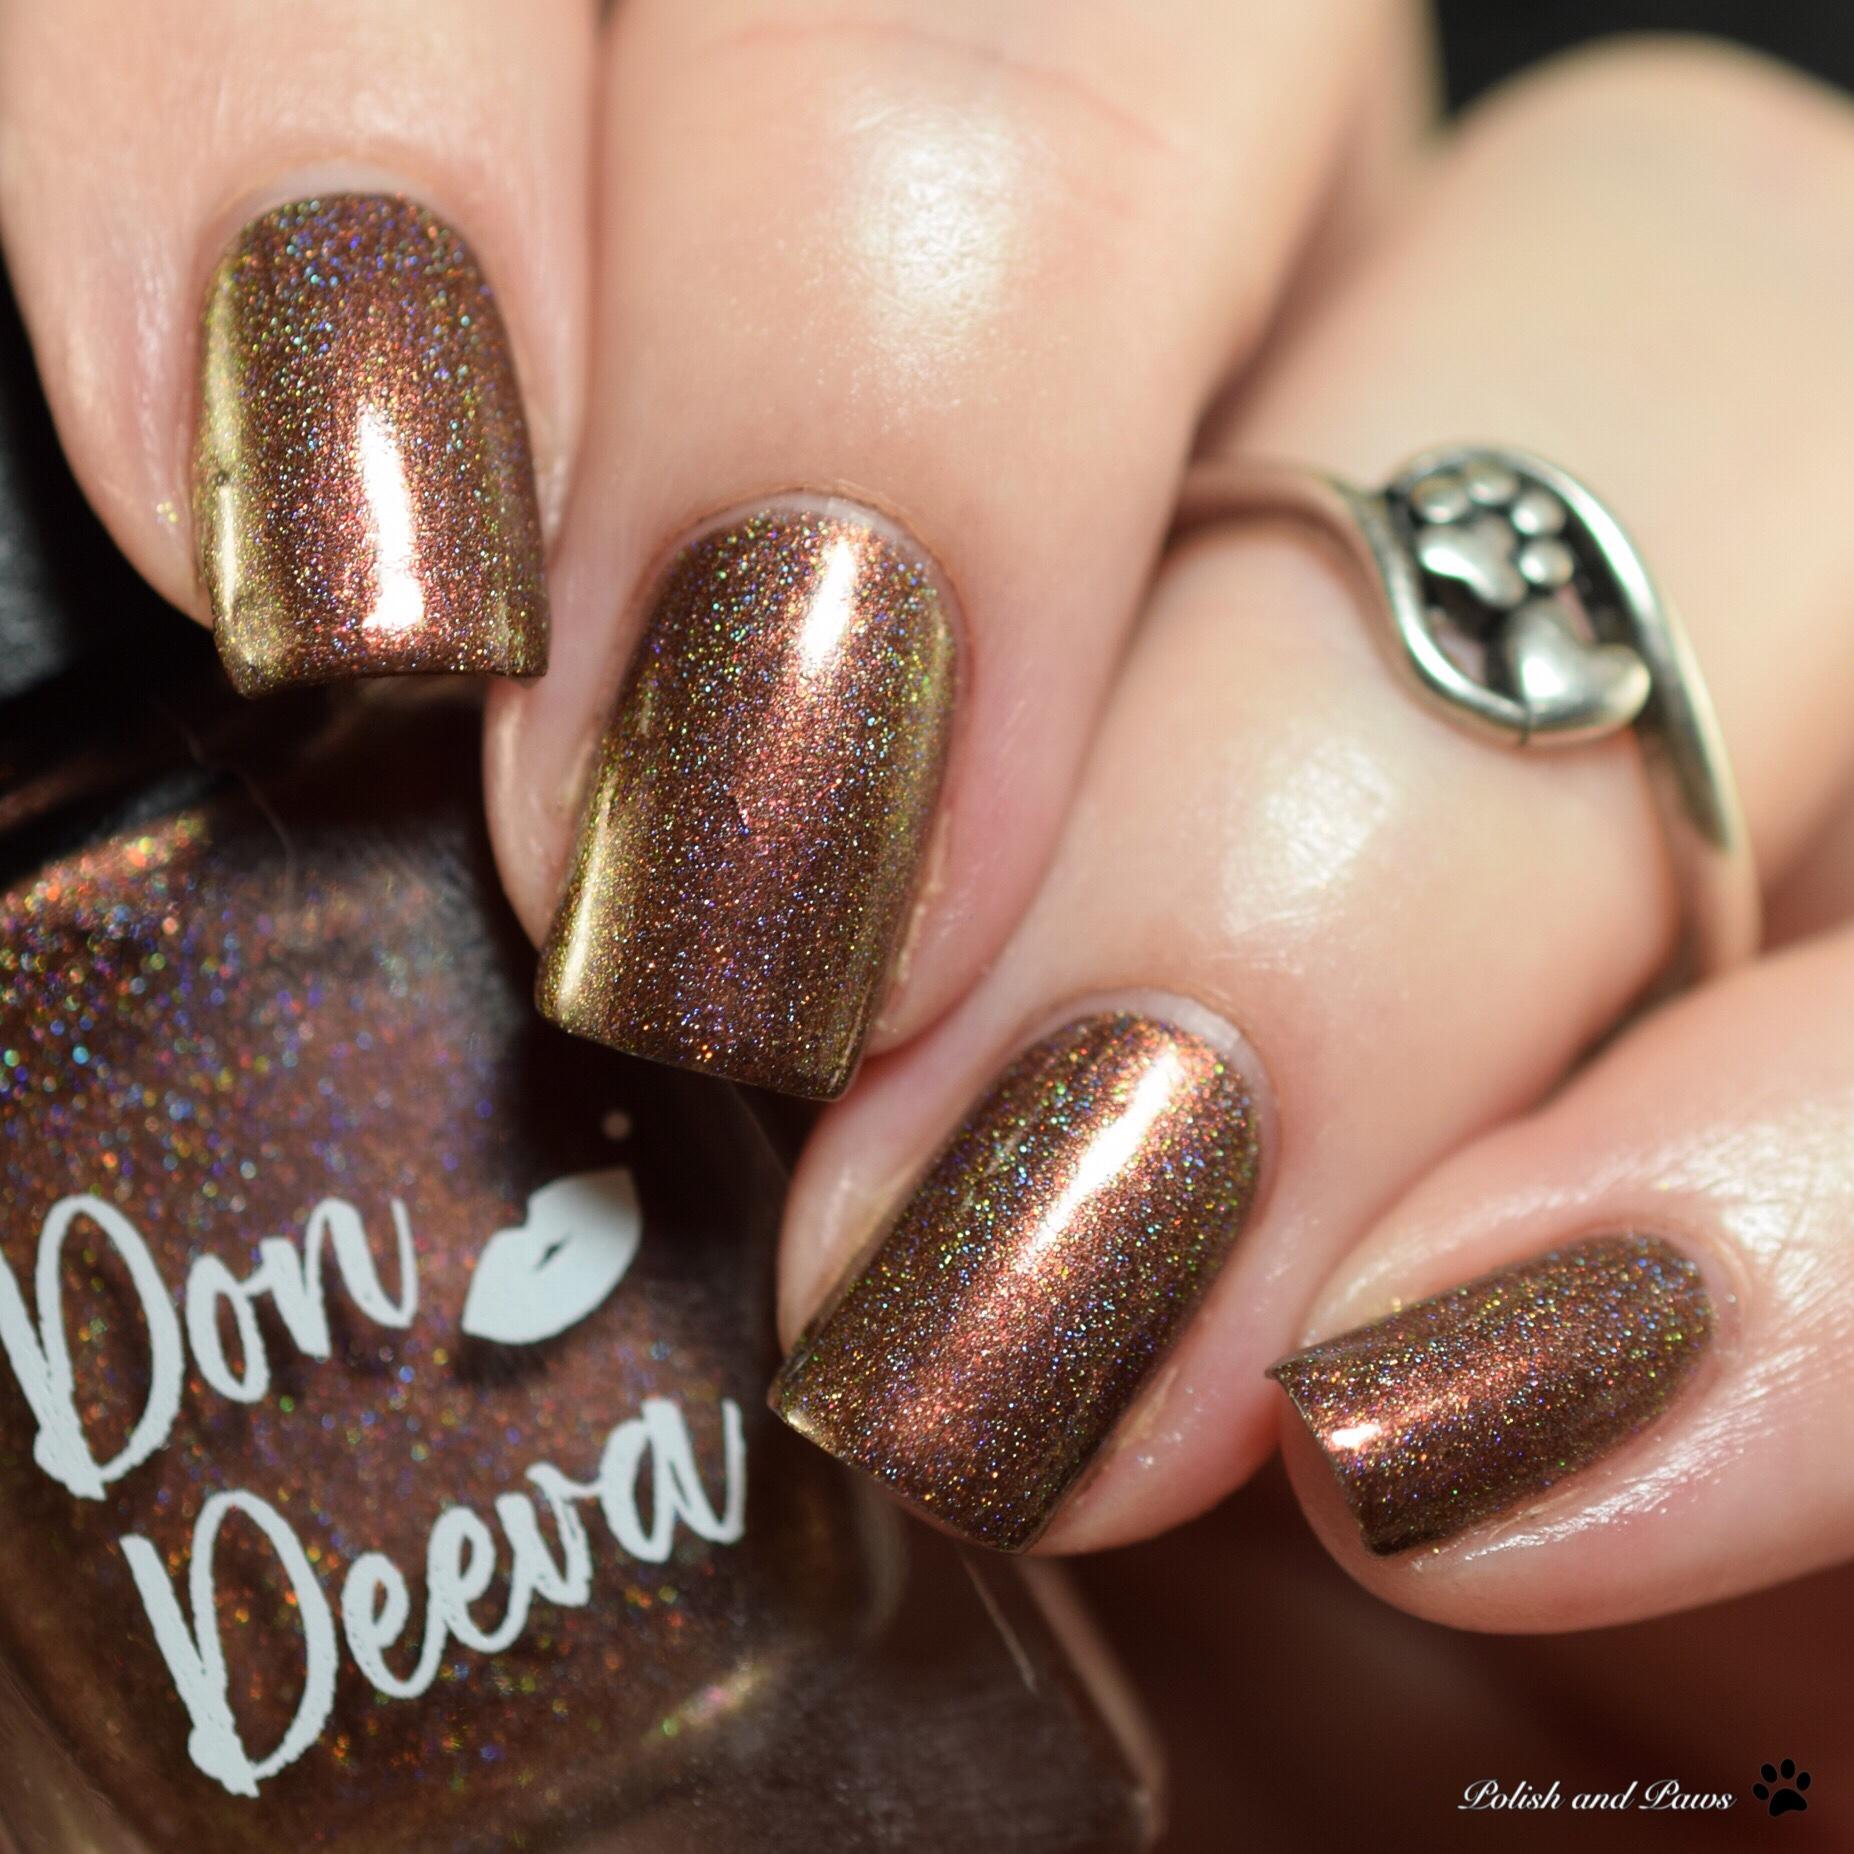 Don Deeva Chocolate Sips or Skinny Dips?